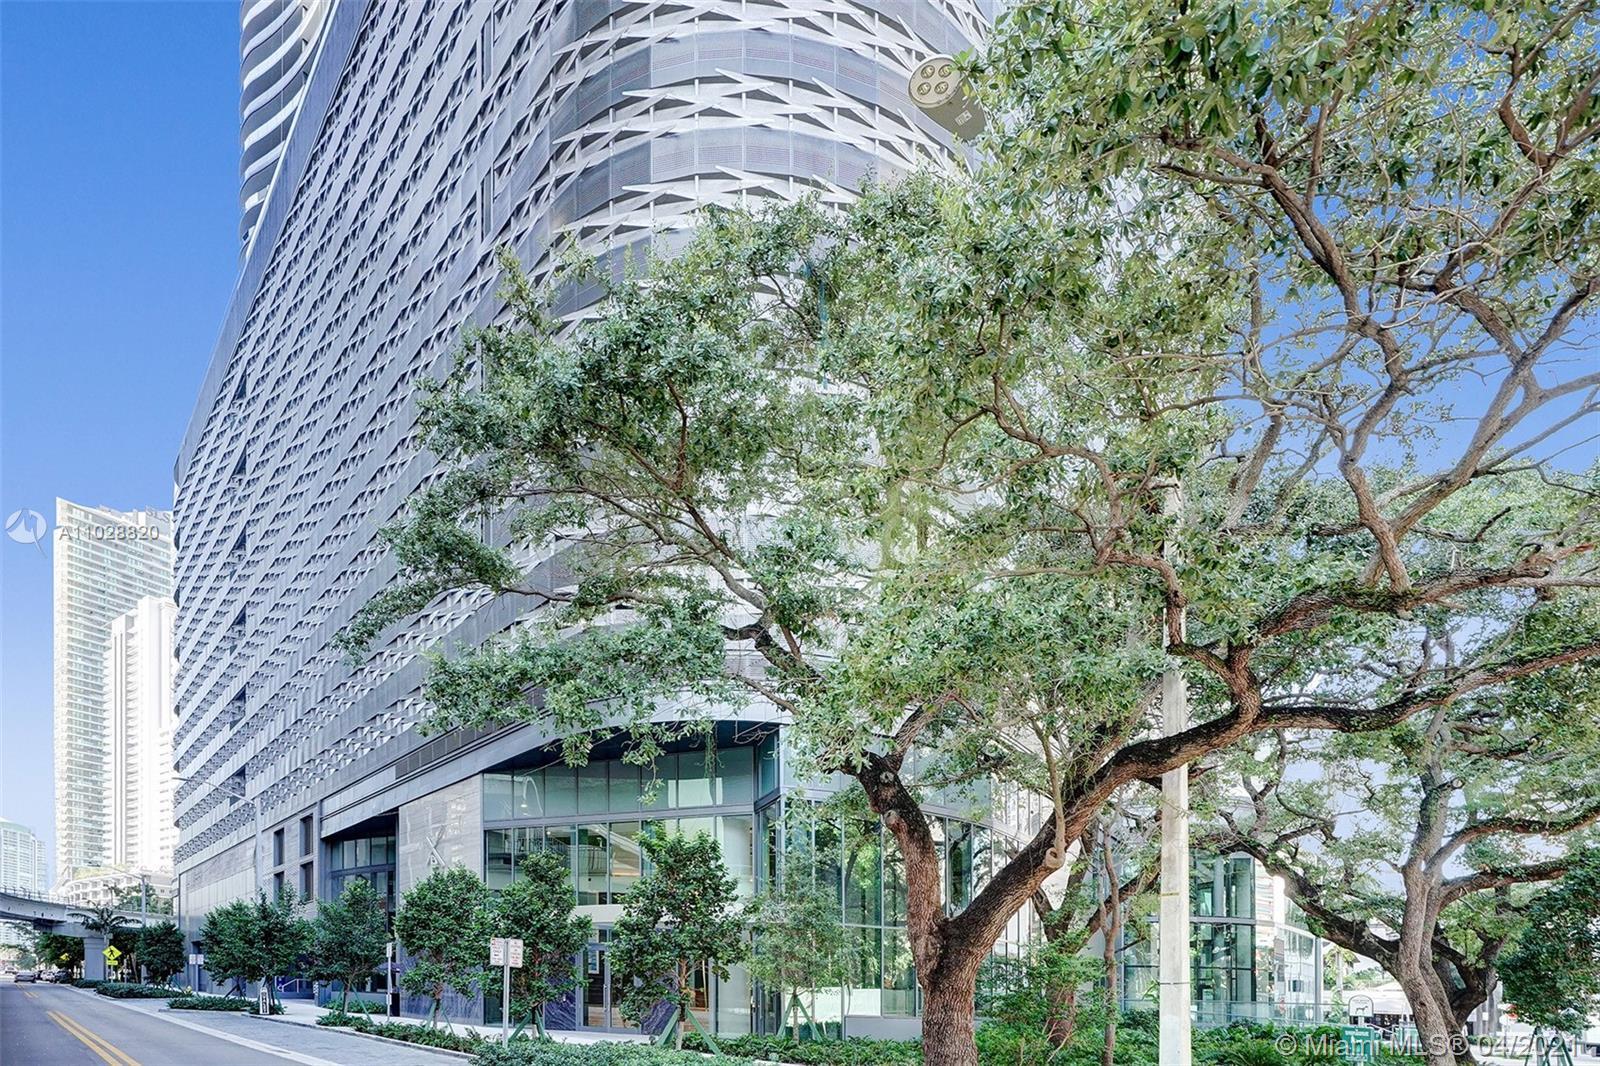 Brickell FlatIron #PH5106 - 1000 Brickell Plz #PH5106, Miami, FL 33131